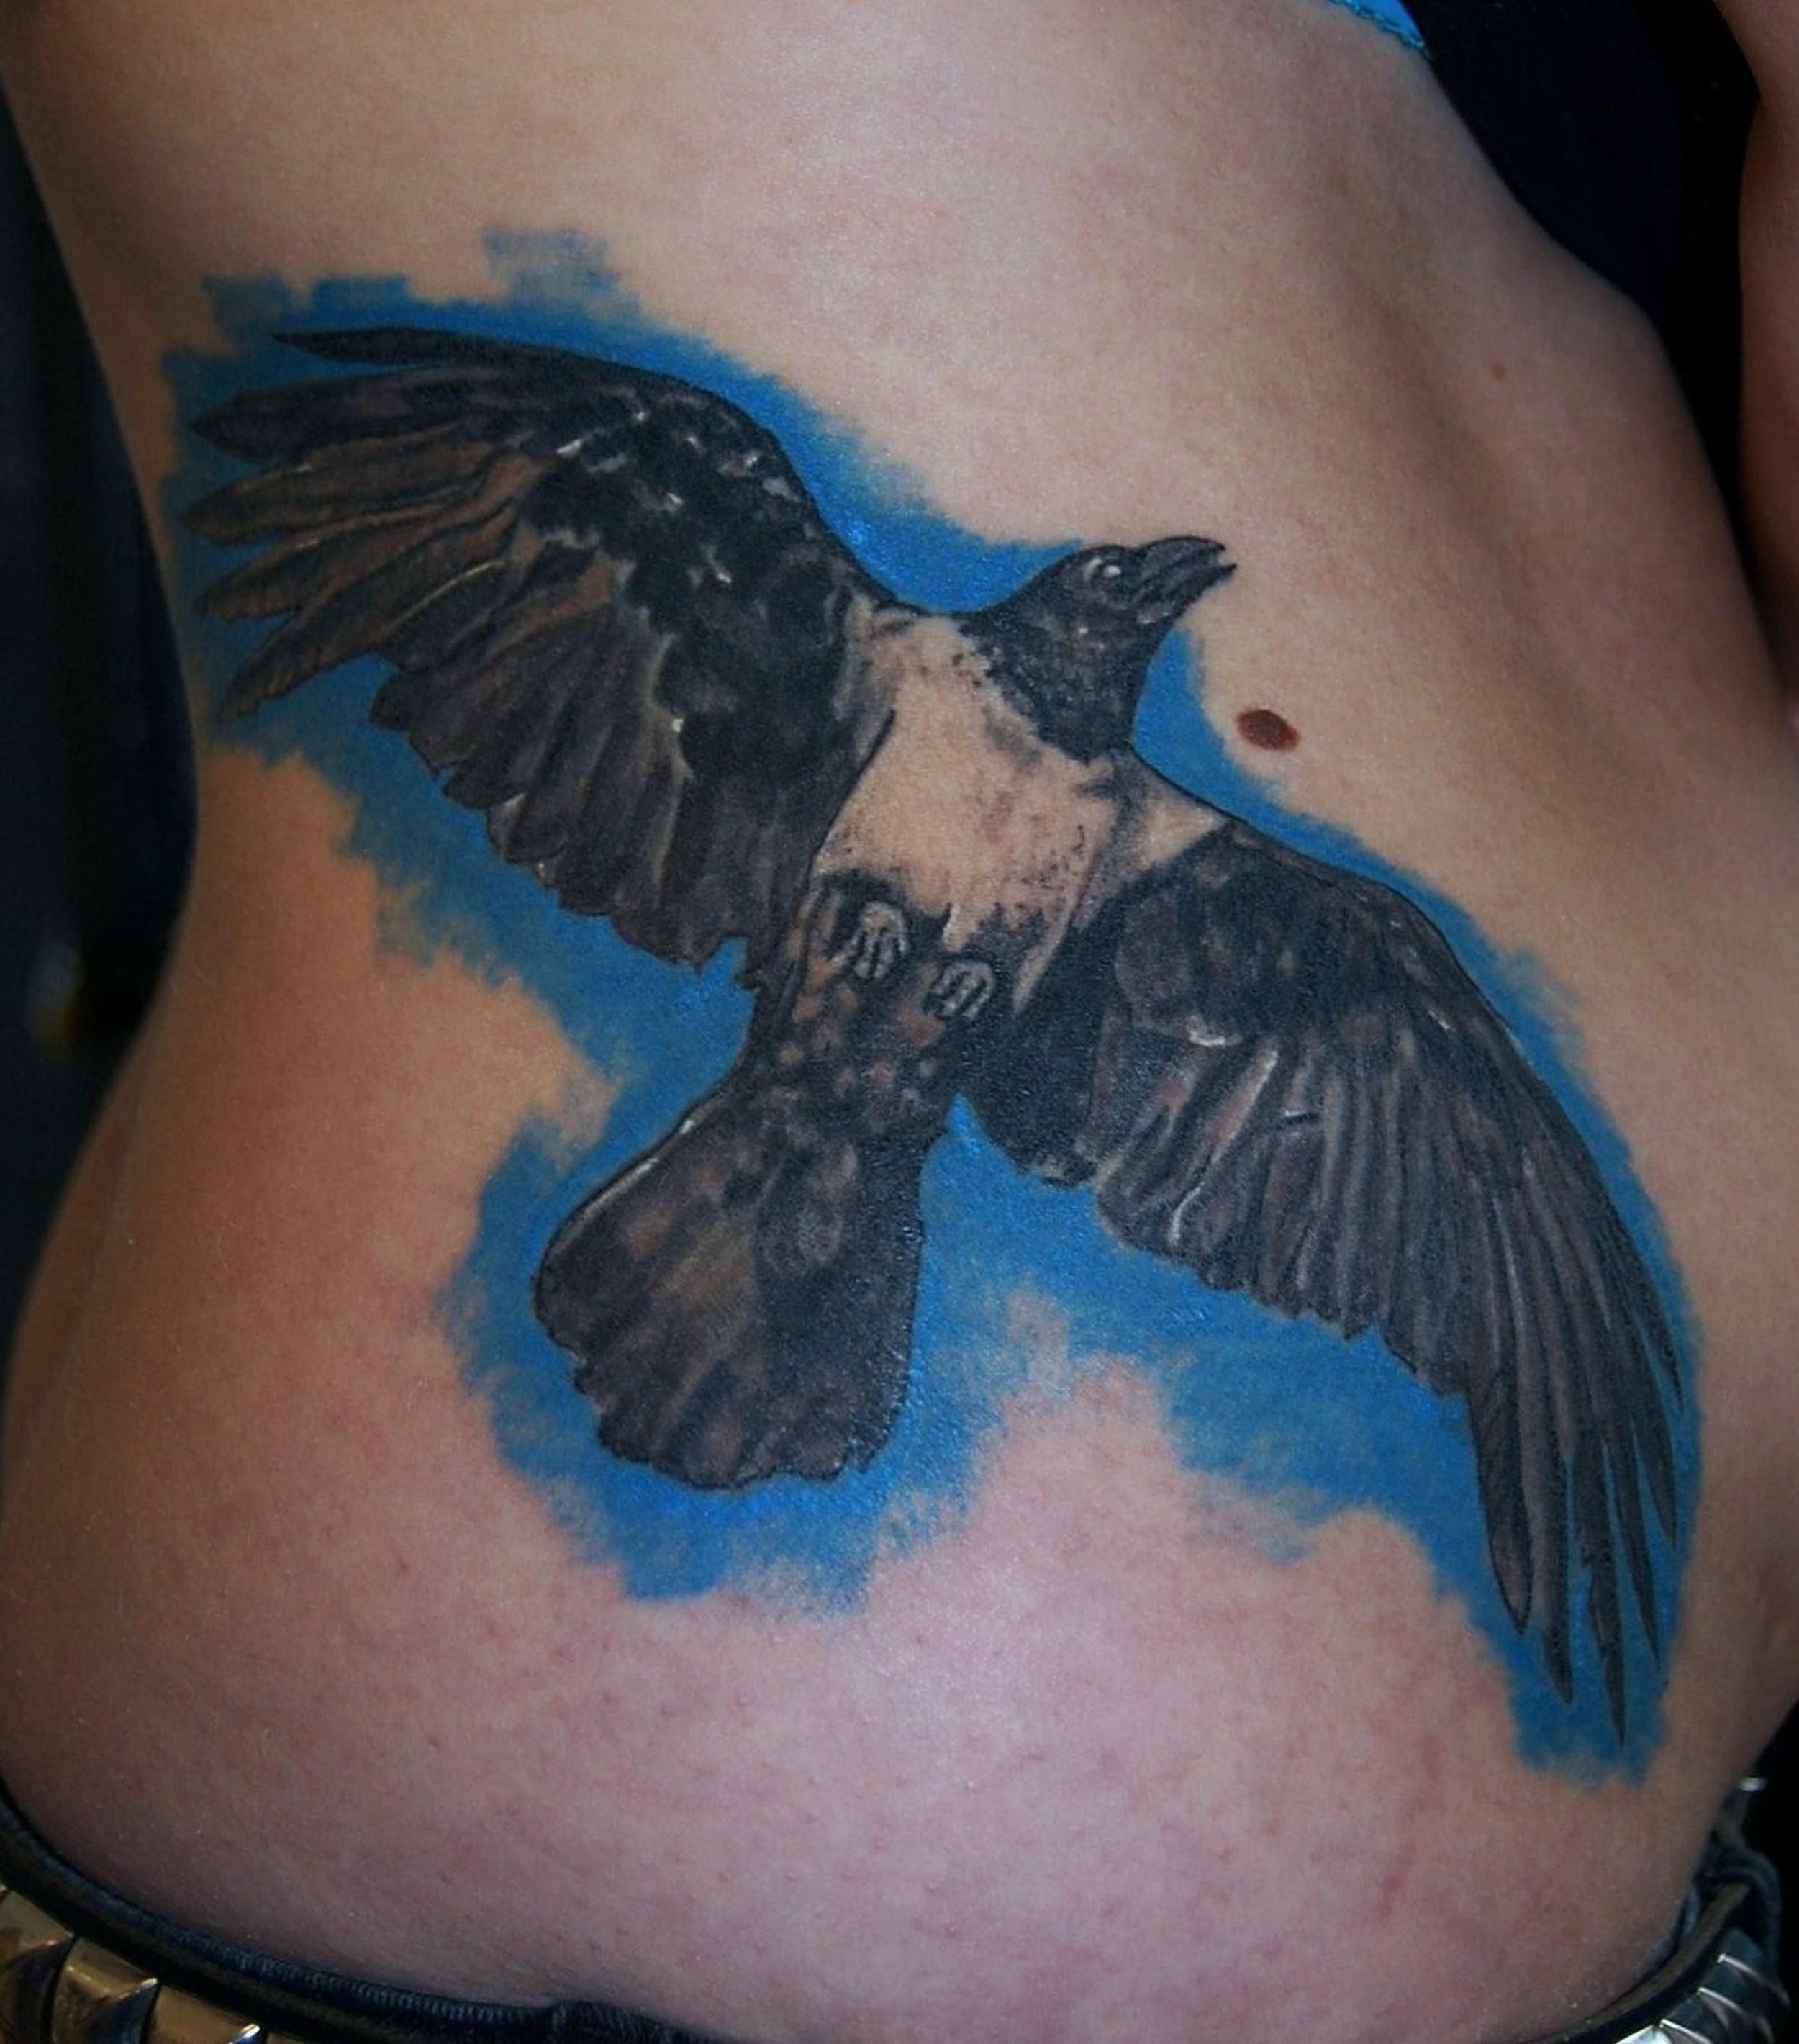 mick raven healed2.JPG